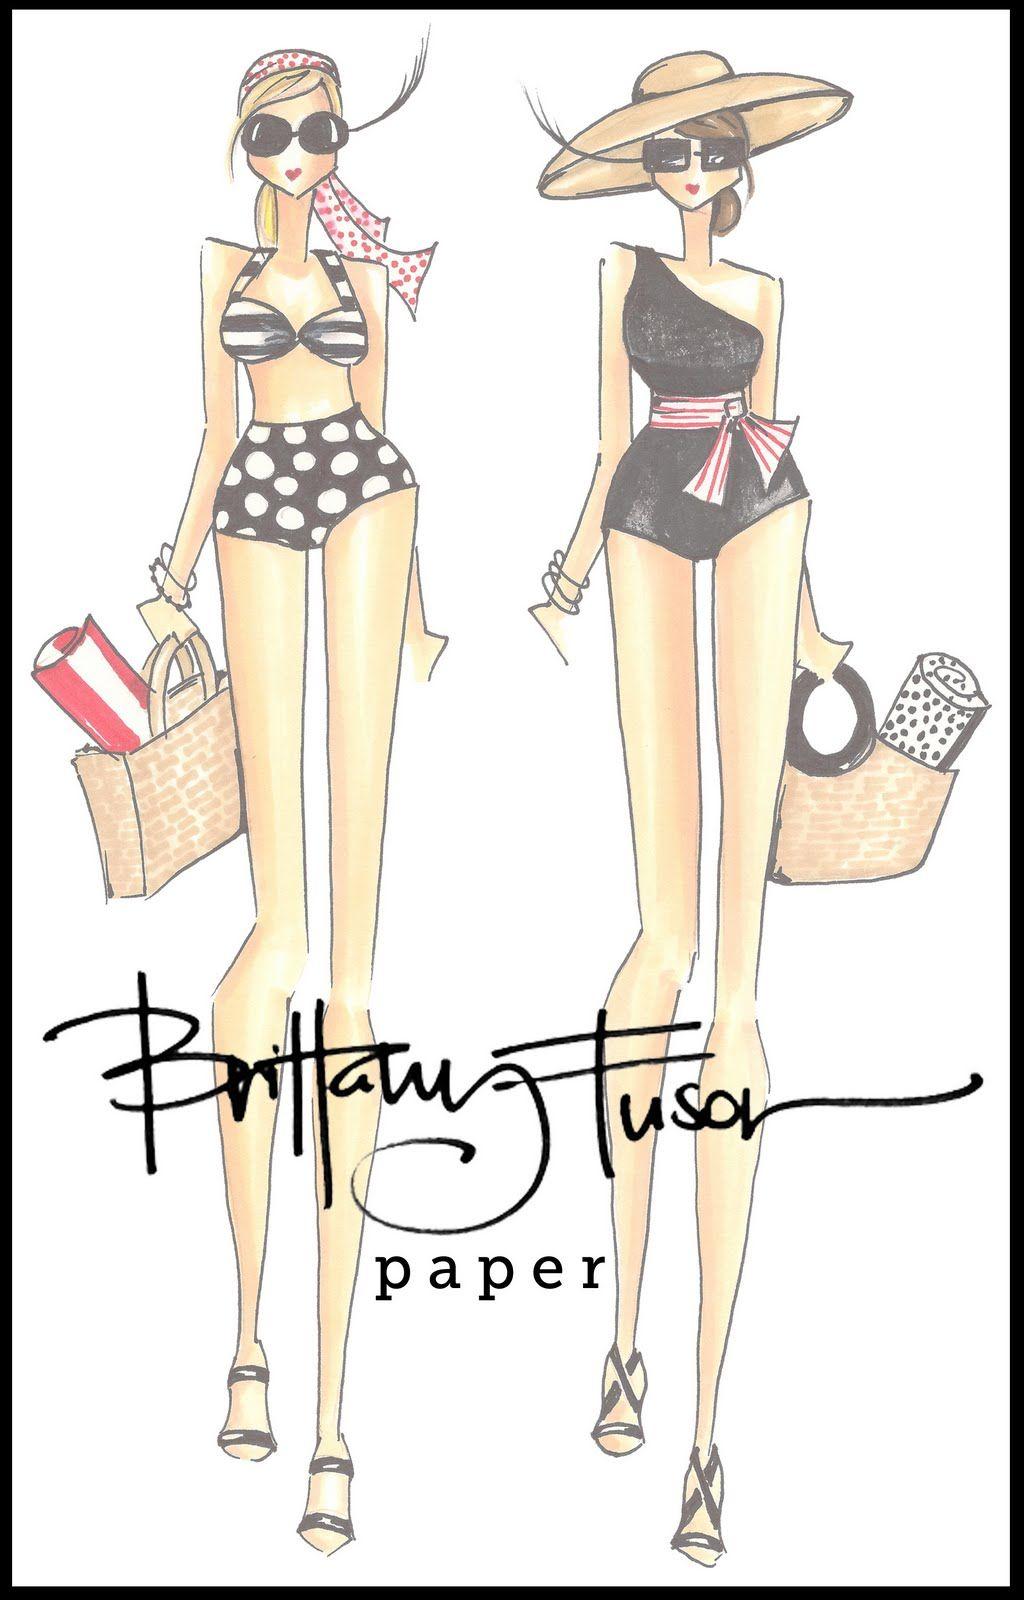 Brittany Fuson: new name, same game